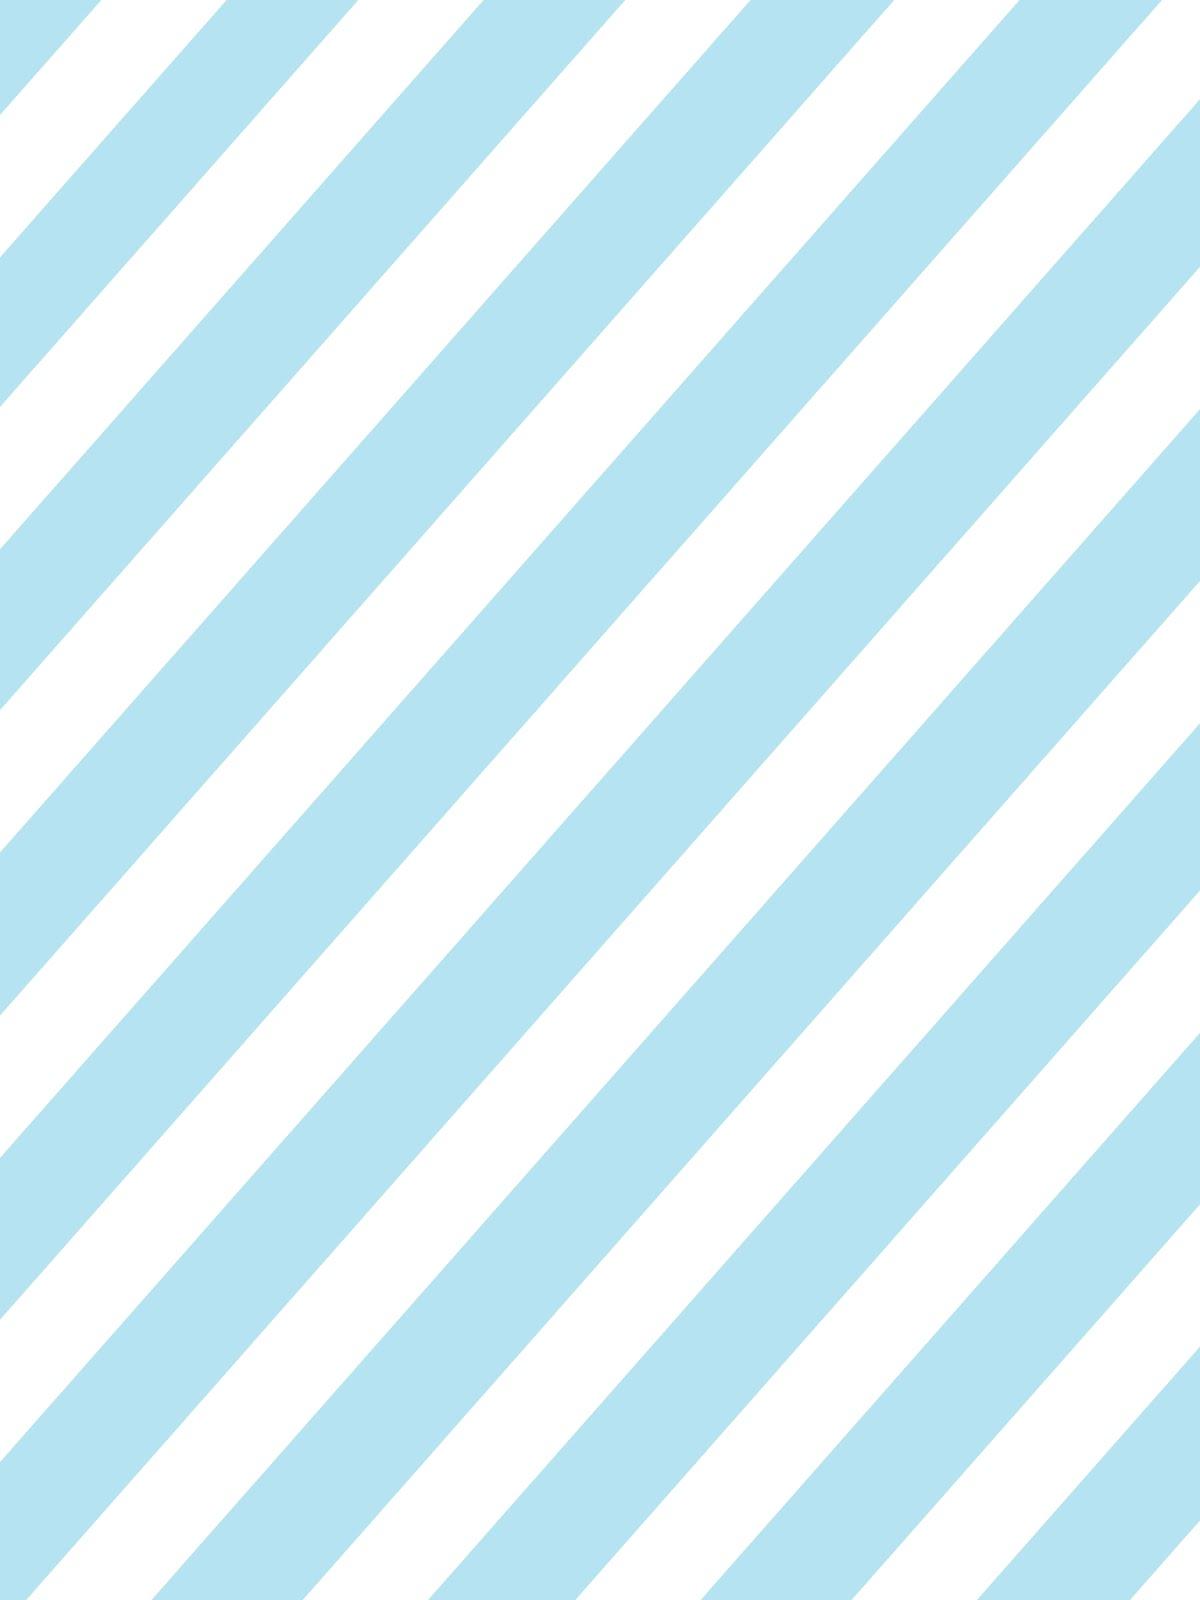 julesoca blog: Pattern-Side Stripe-Light Gray,Baby Blue ...